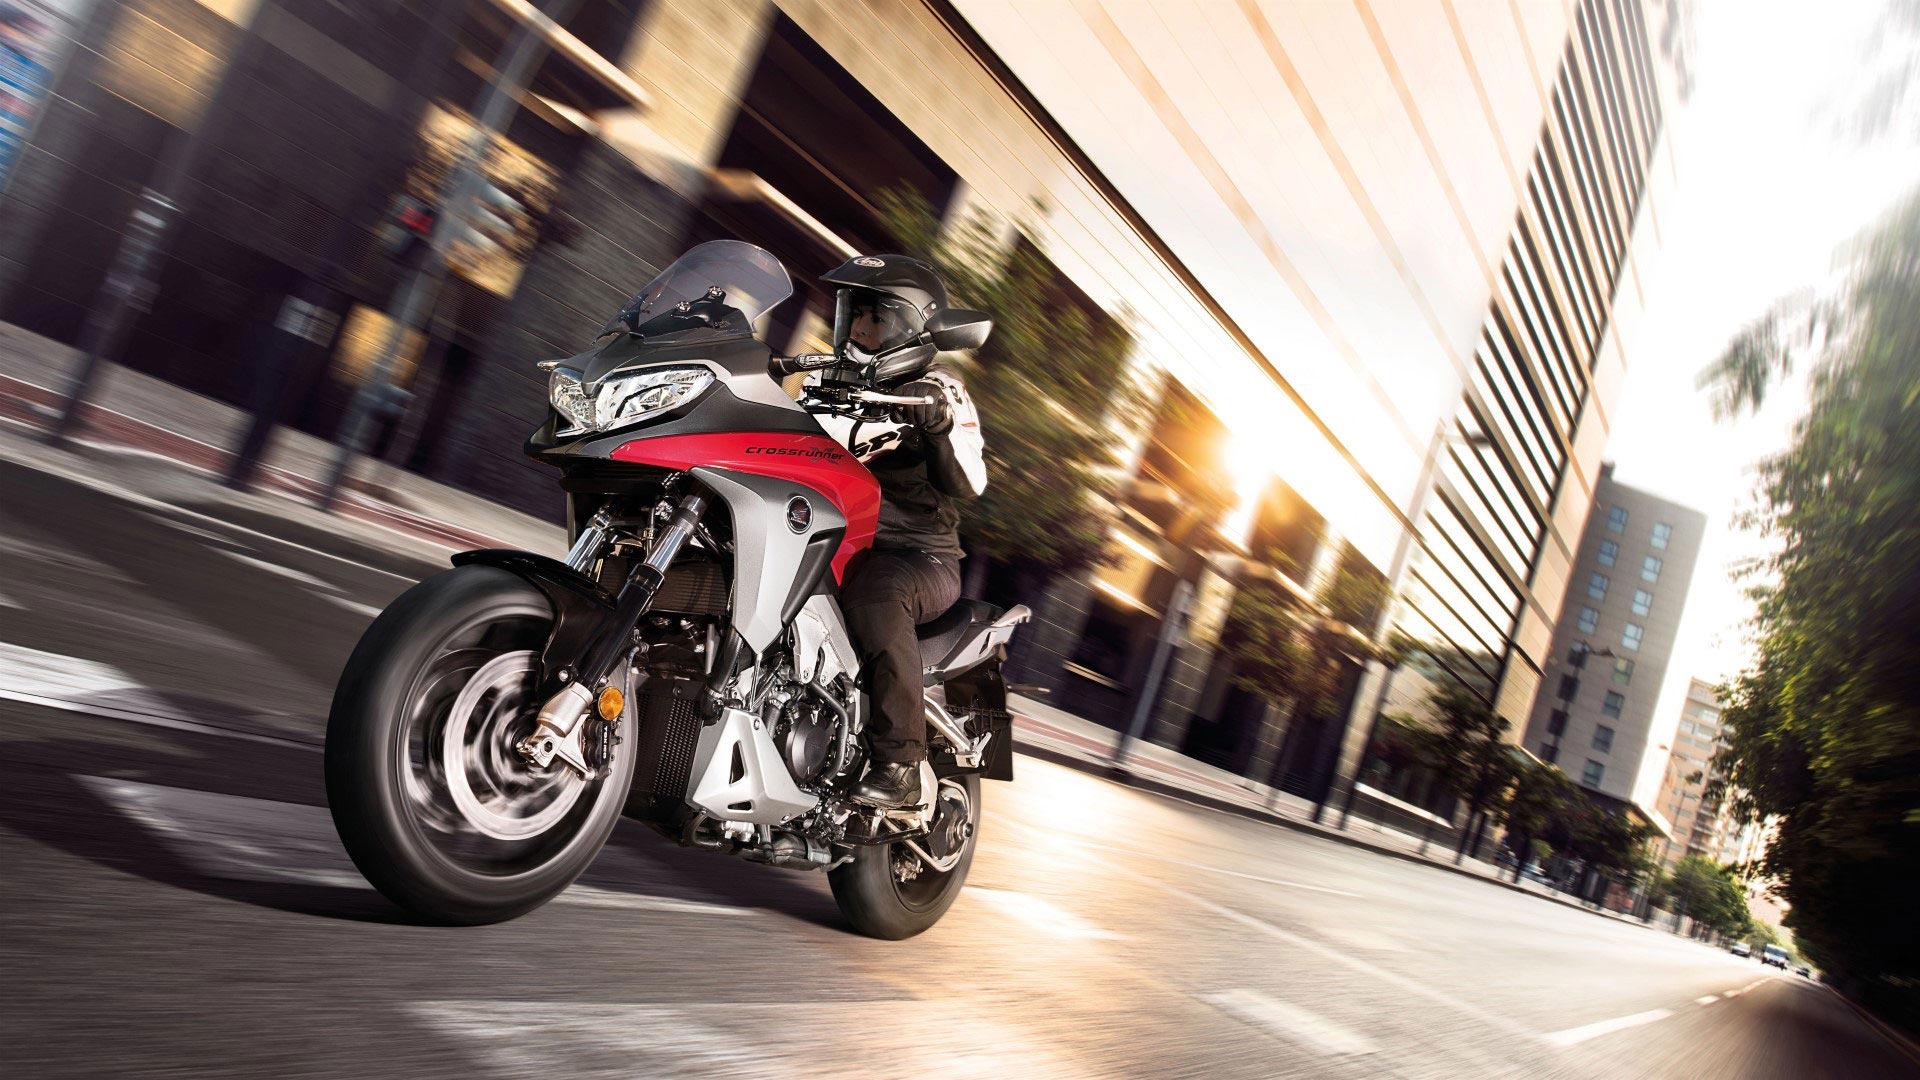 Honda Crossrunner Bakker Motors Zaandam